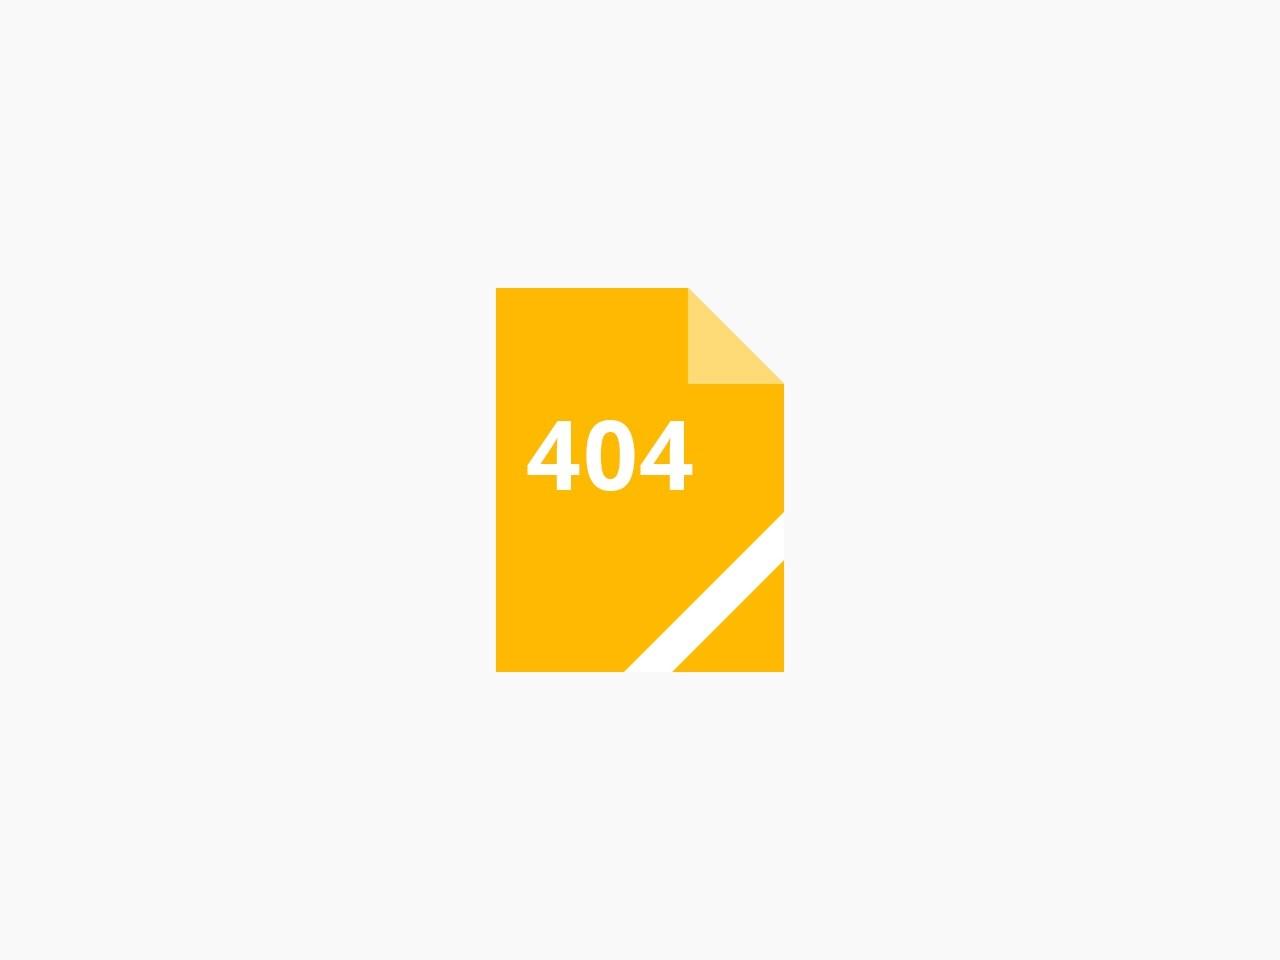 http://bibliotekapsp9.republika.pl.nerdydata.com